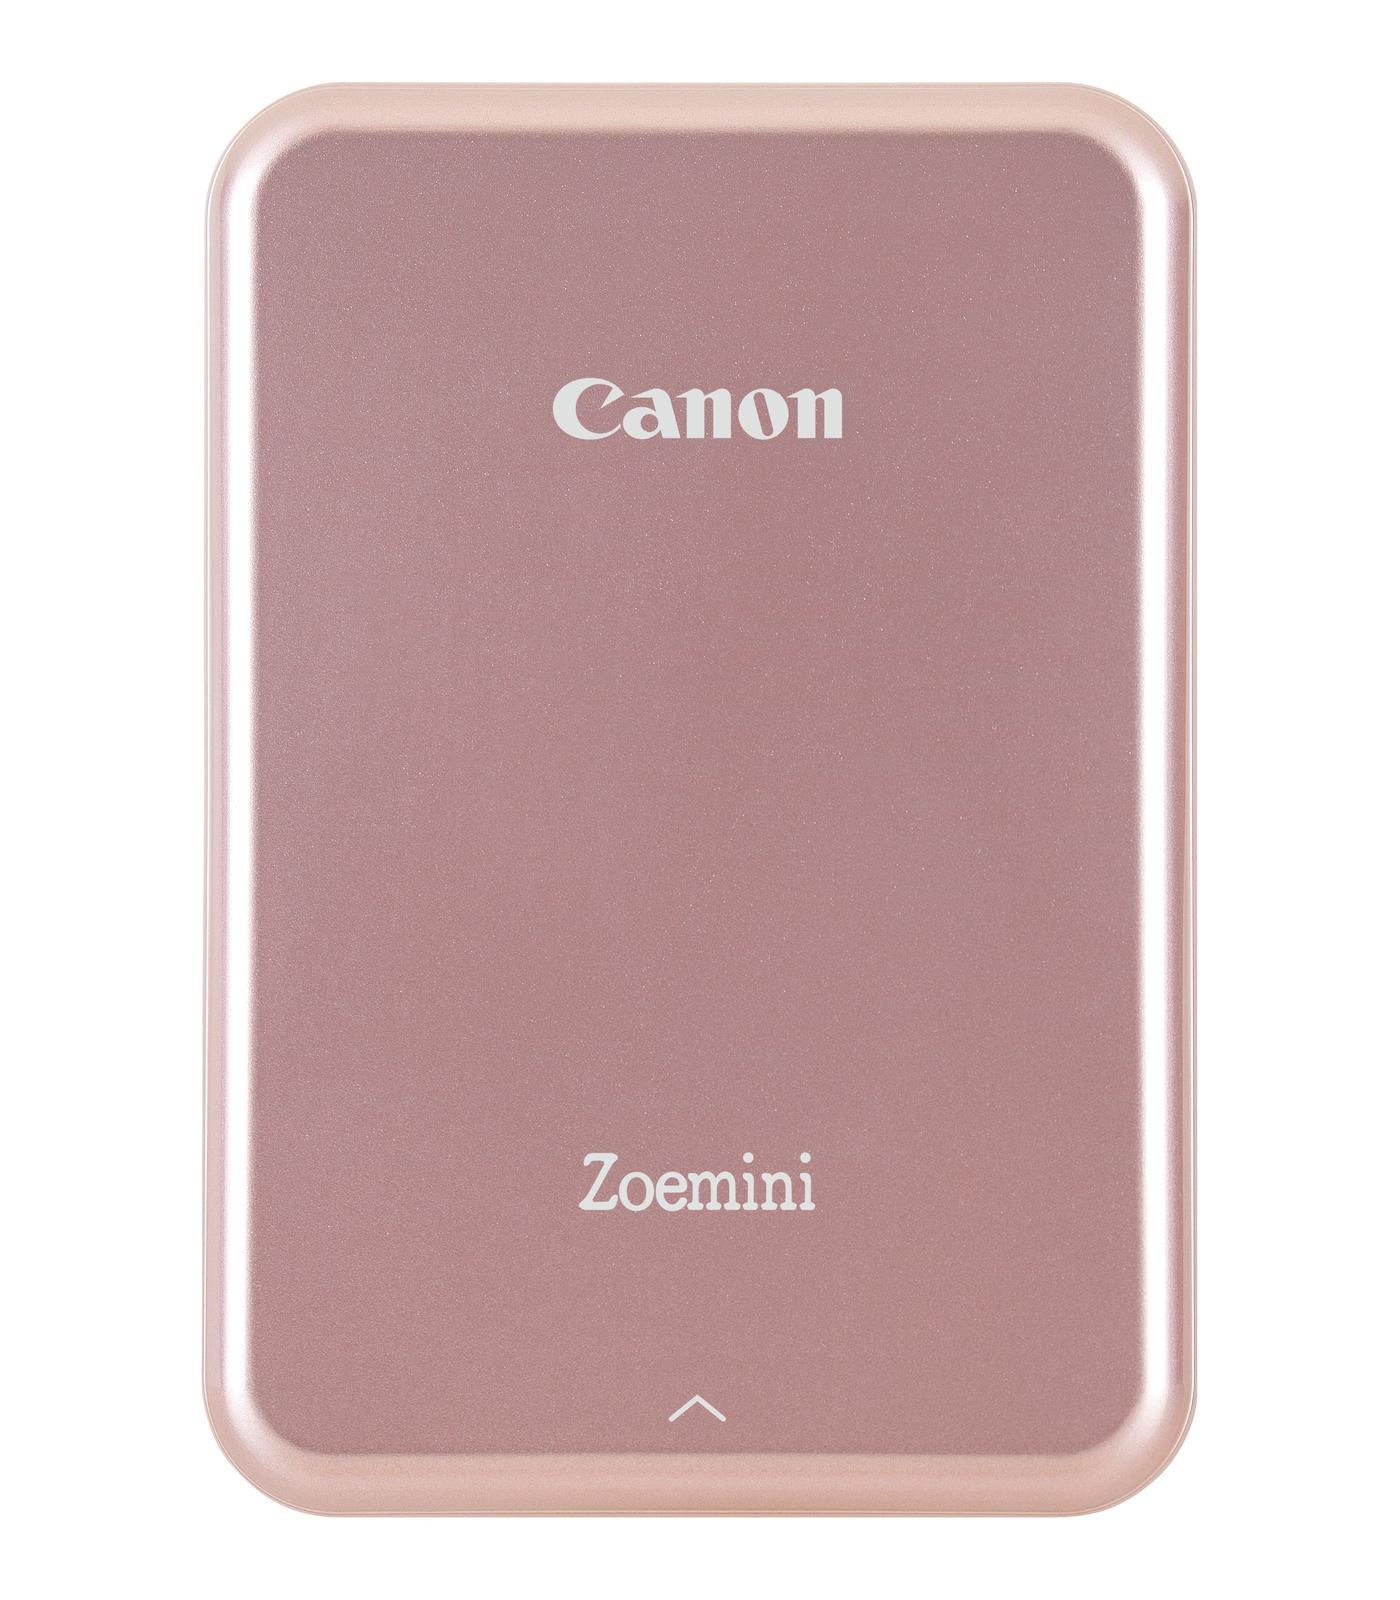 Canon Zoemini mobiler Fotodrucker Rose-Gold inkl. 10 Blatt Fotopapier 3204C004 (Zero-Ink, Randloser Druck, Bluetooth) printeris